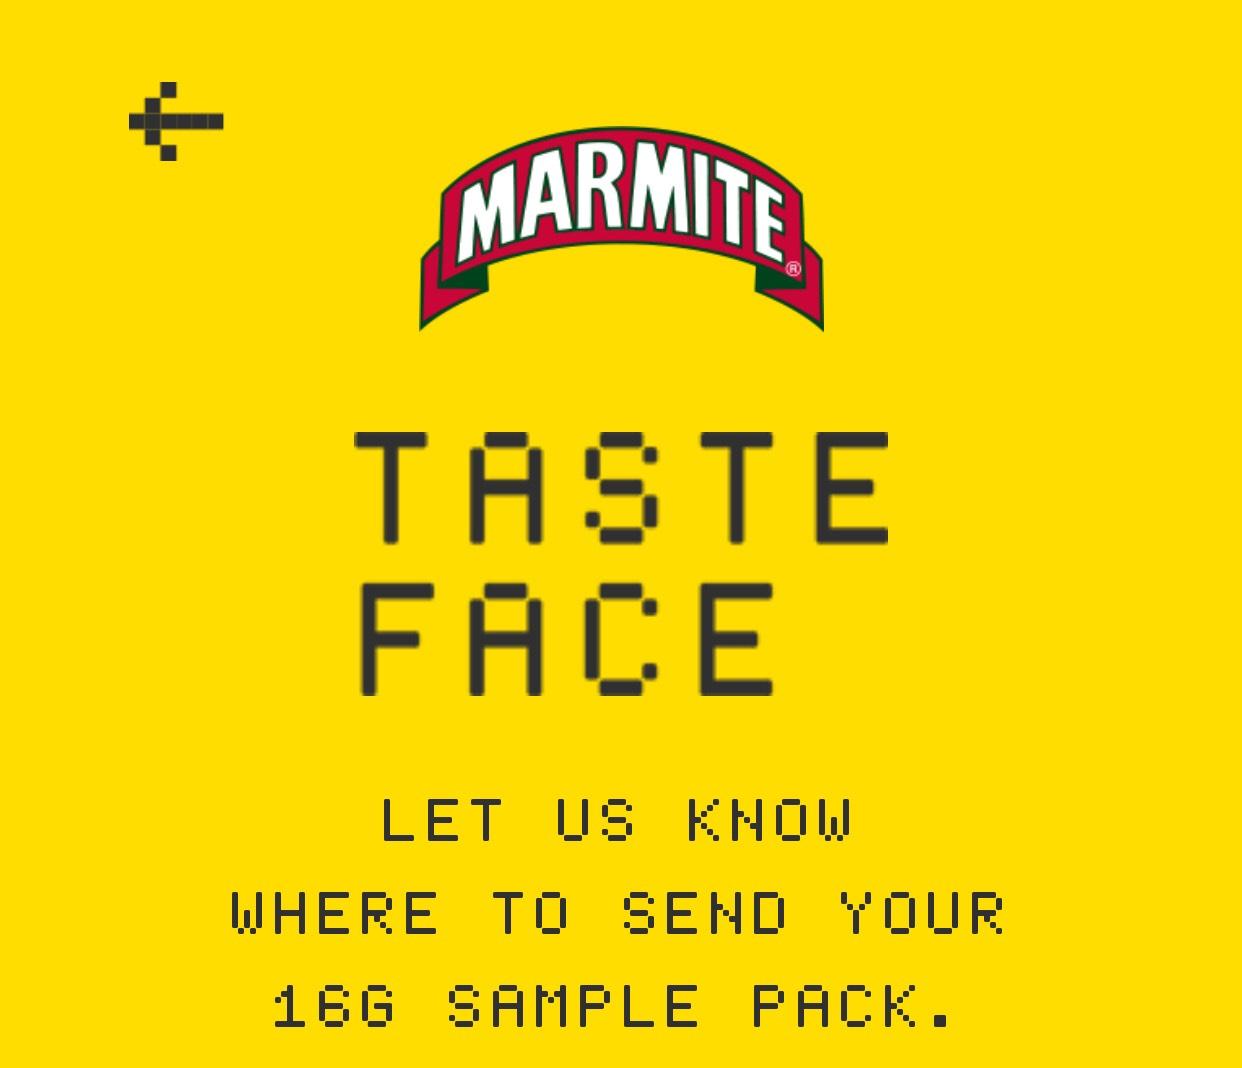 Free Marmite 16g sample